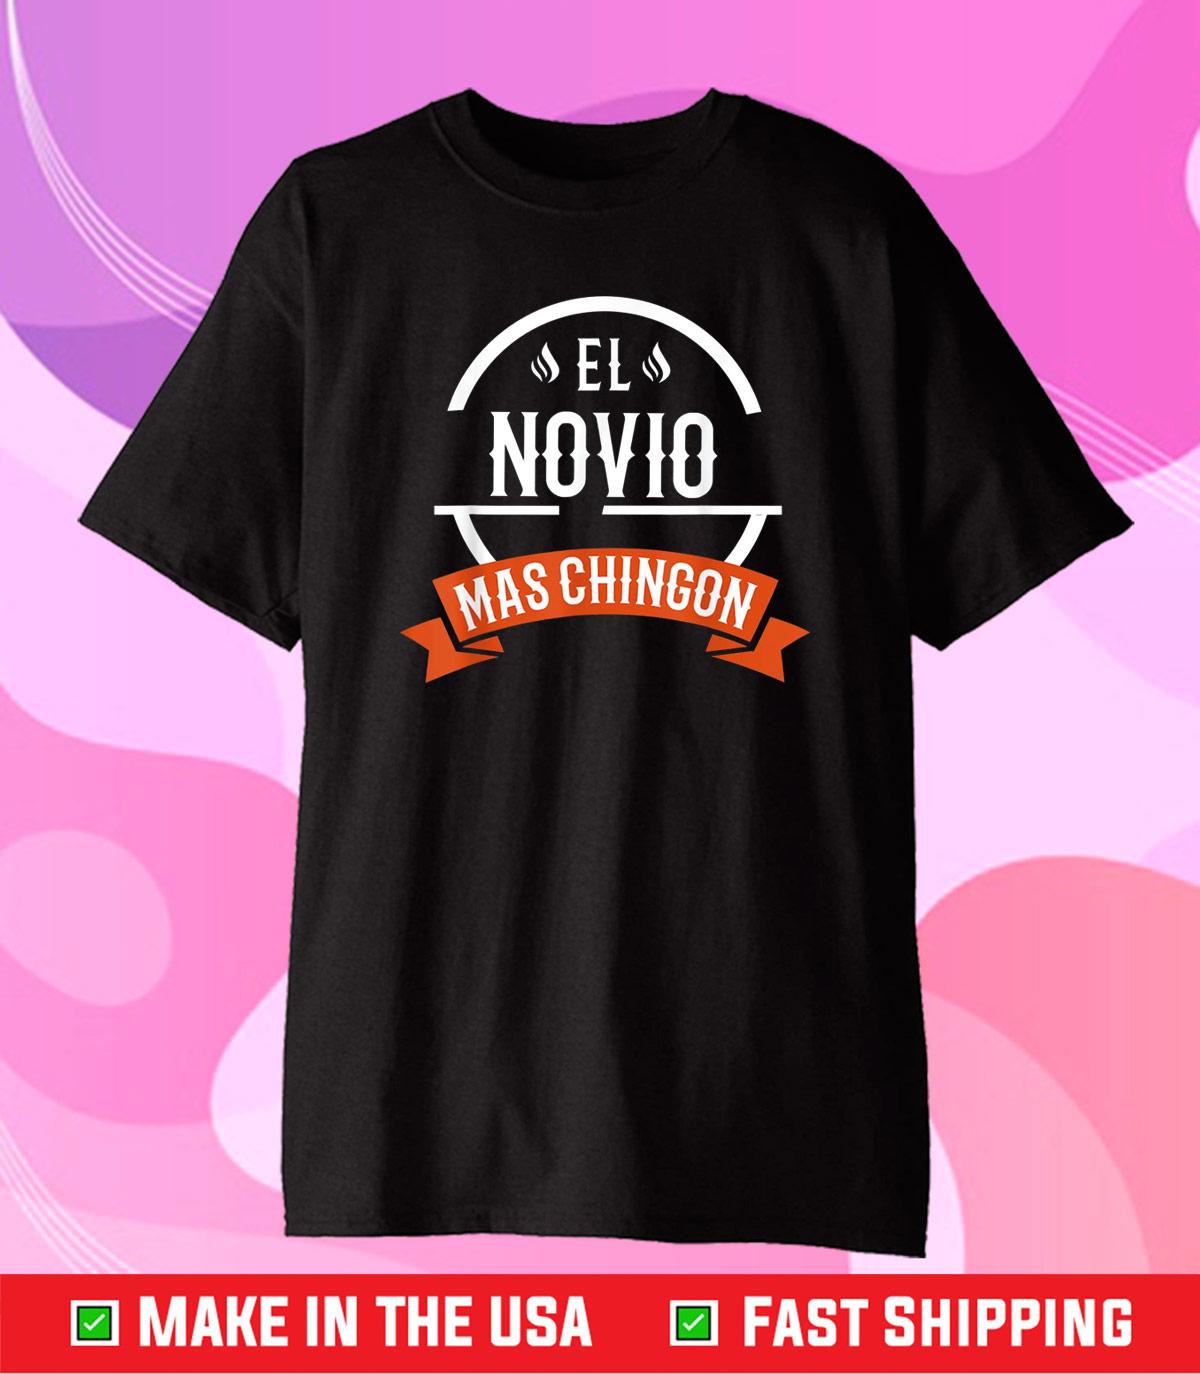 El Novio Mas Chingon Boyfriend Spanish Gift T-Shirt